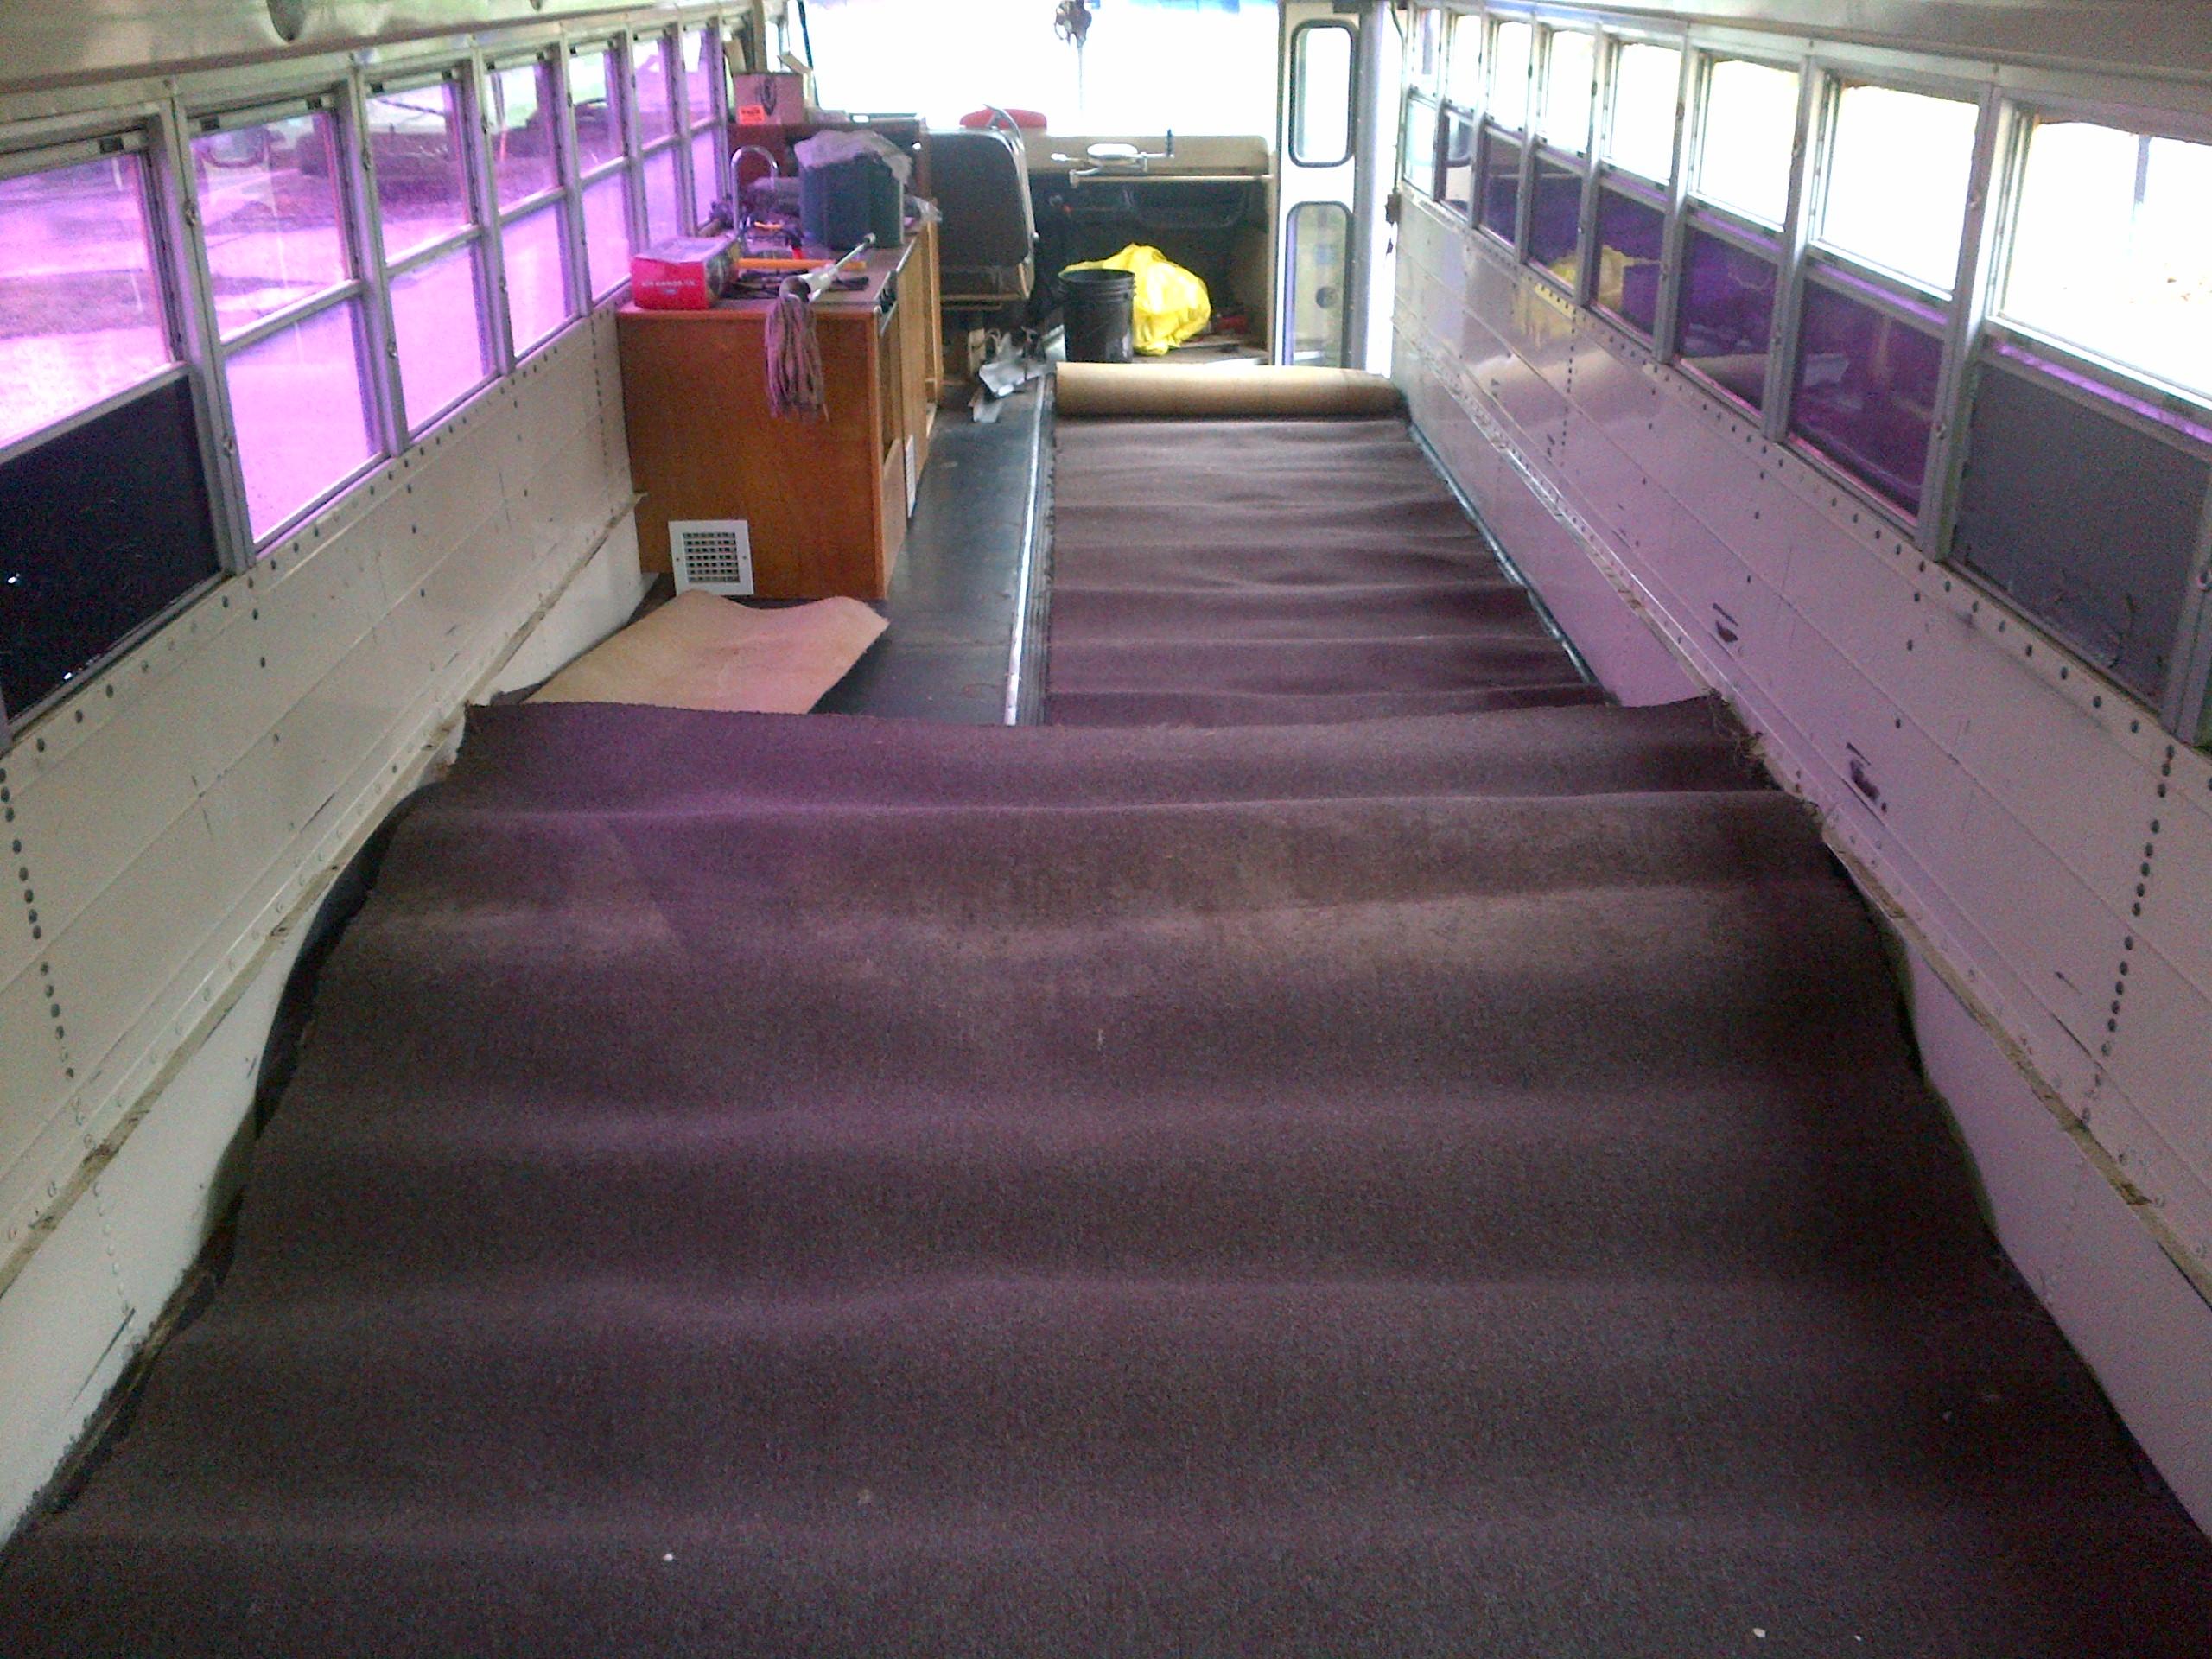 Keiths Schoolbus Conversion Blog Under Carpet Flat Wiring System Additionally Rv Interior Forward View